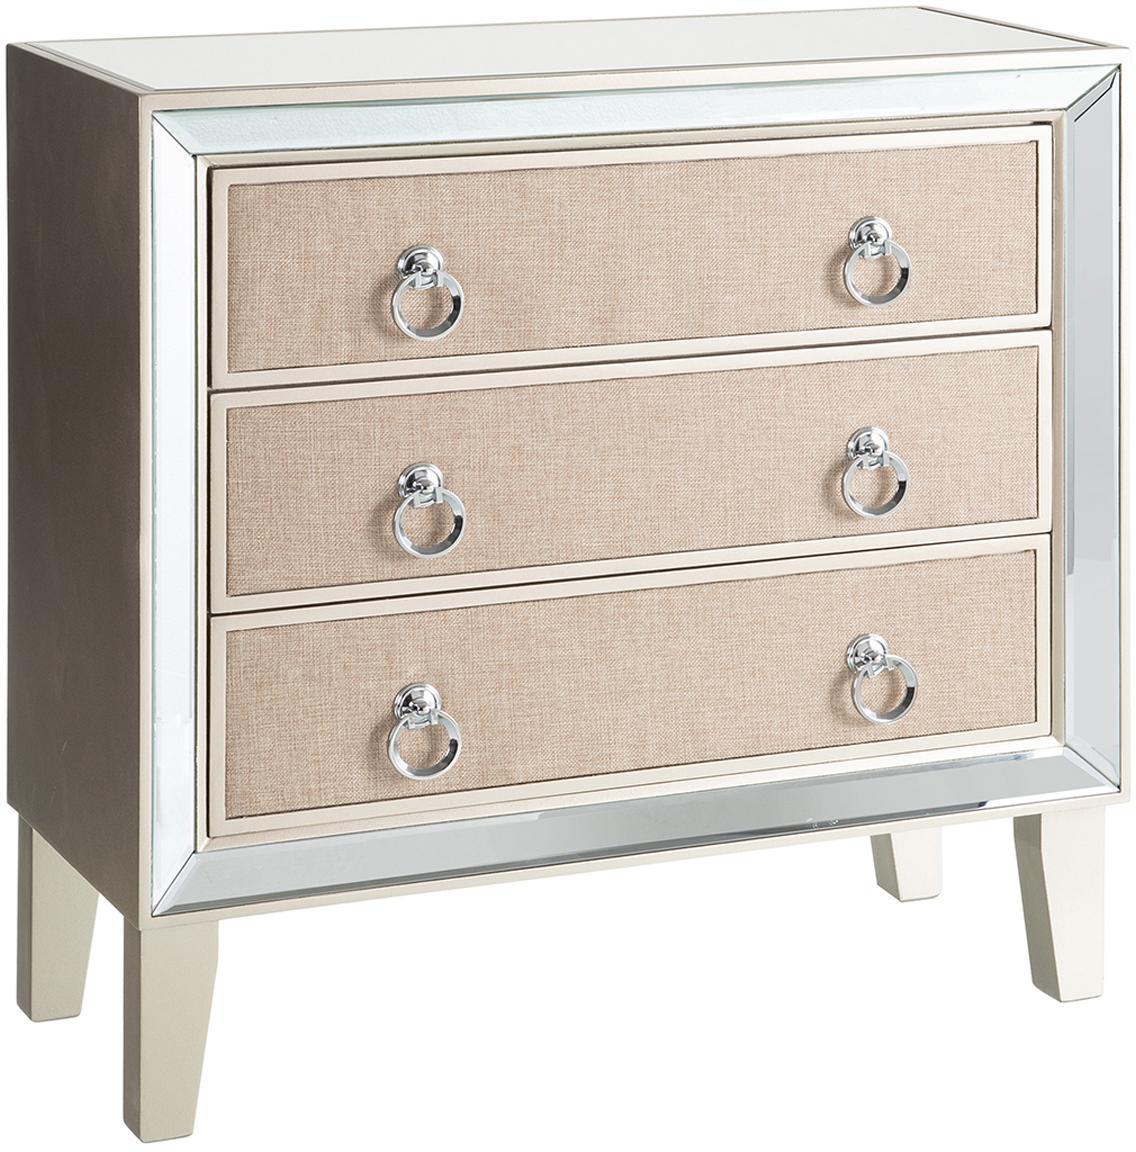 Cómoda Miriam, Blanco crema, beige, An 70 x Al 73 cm